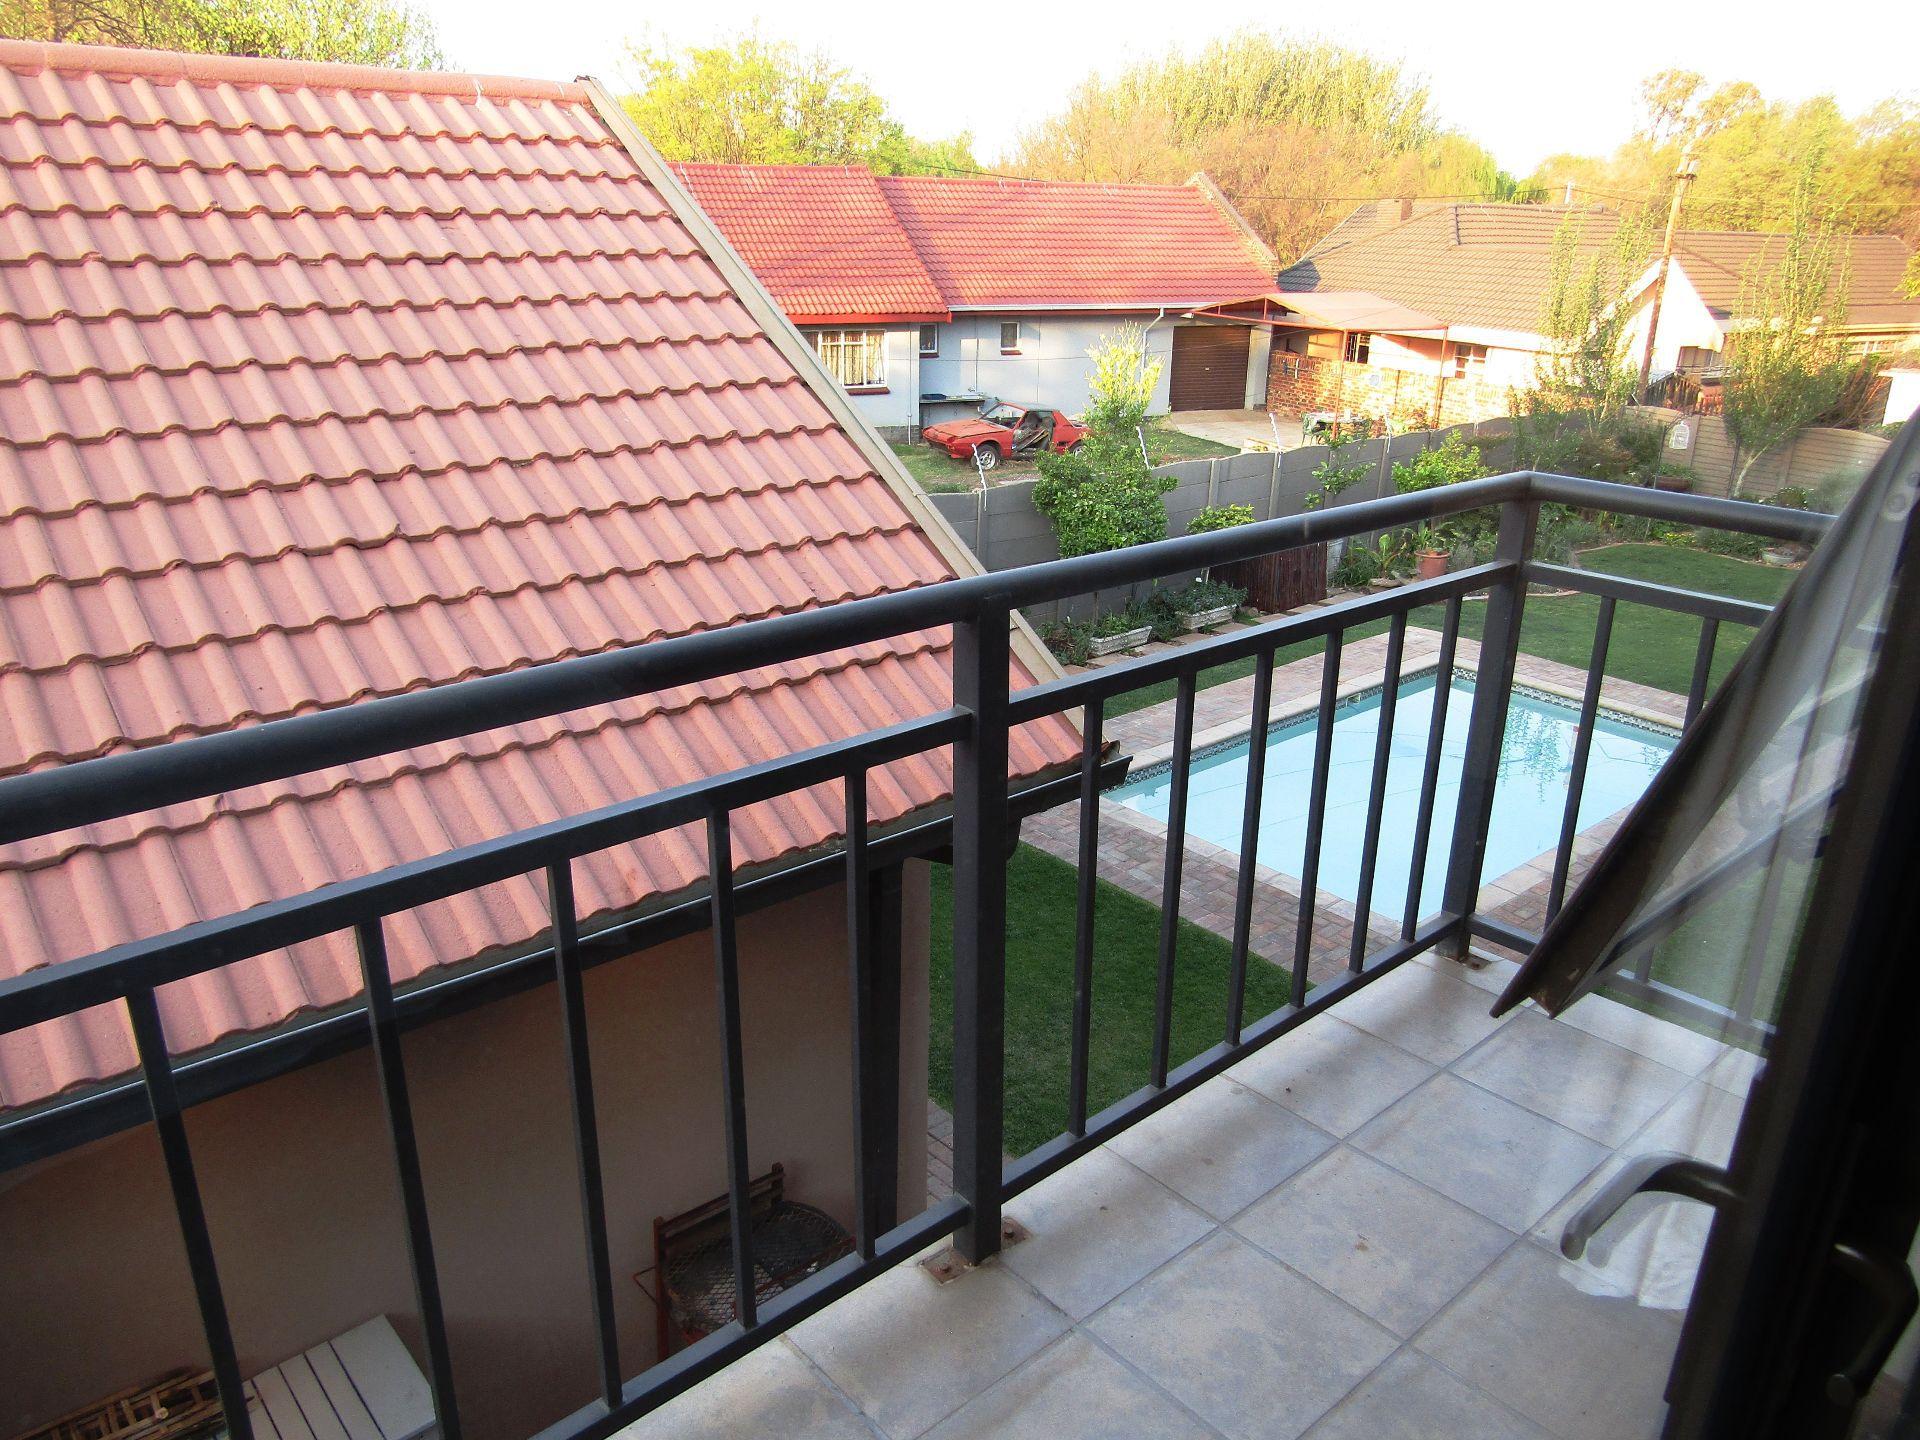 Heilige Akker property for sale. Ref No: 13531943. Picture no 7